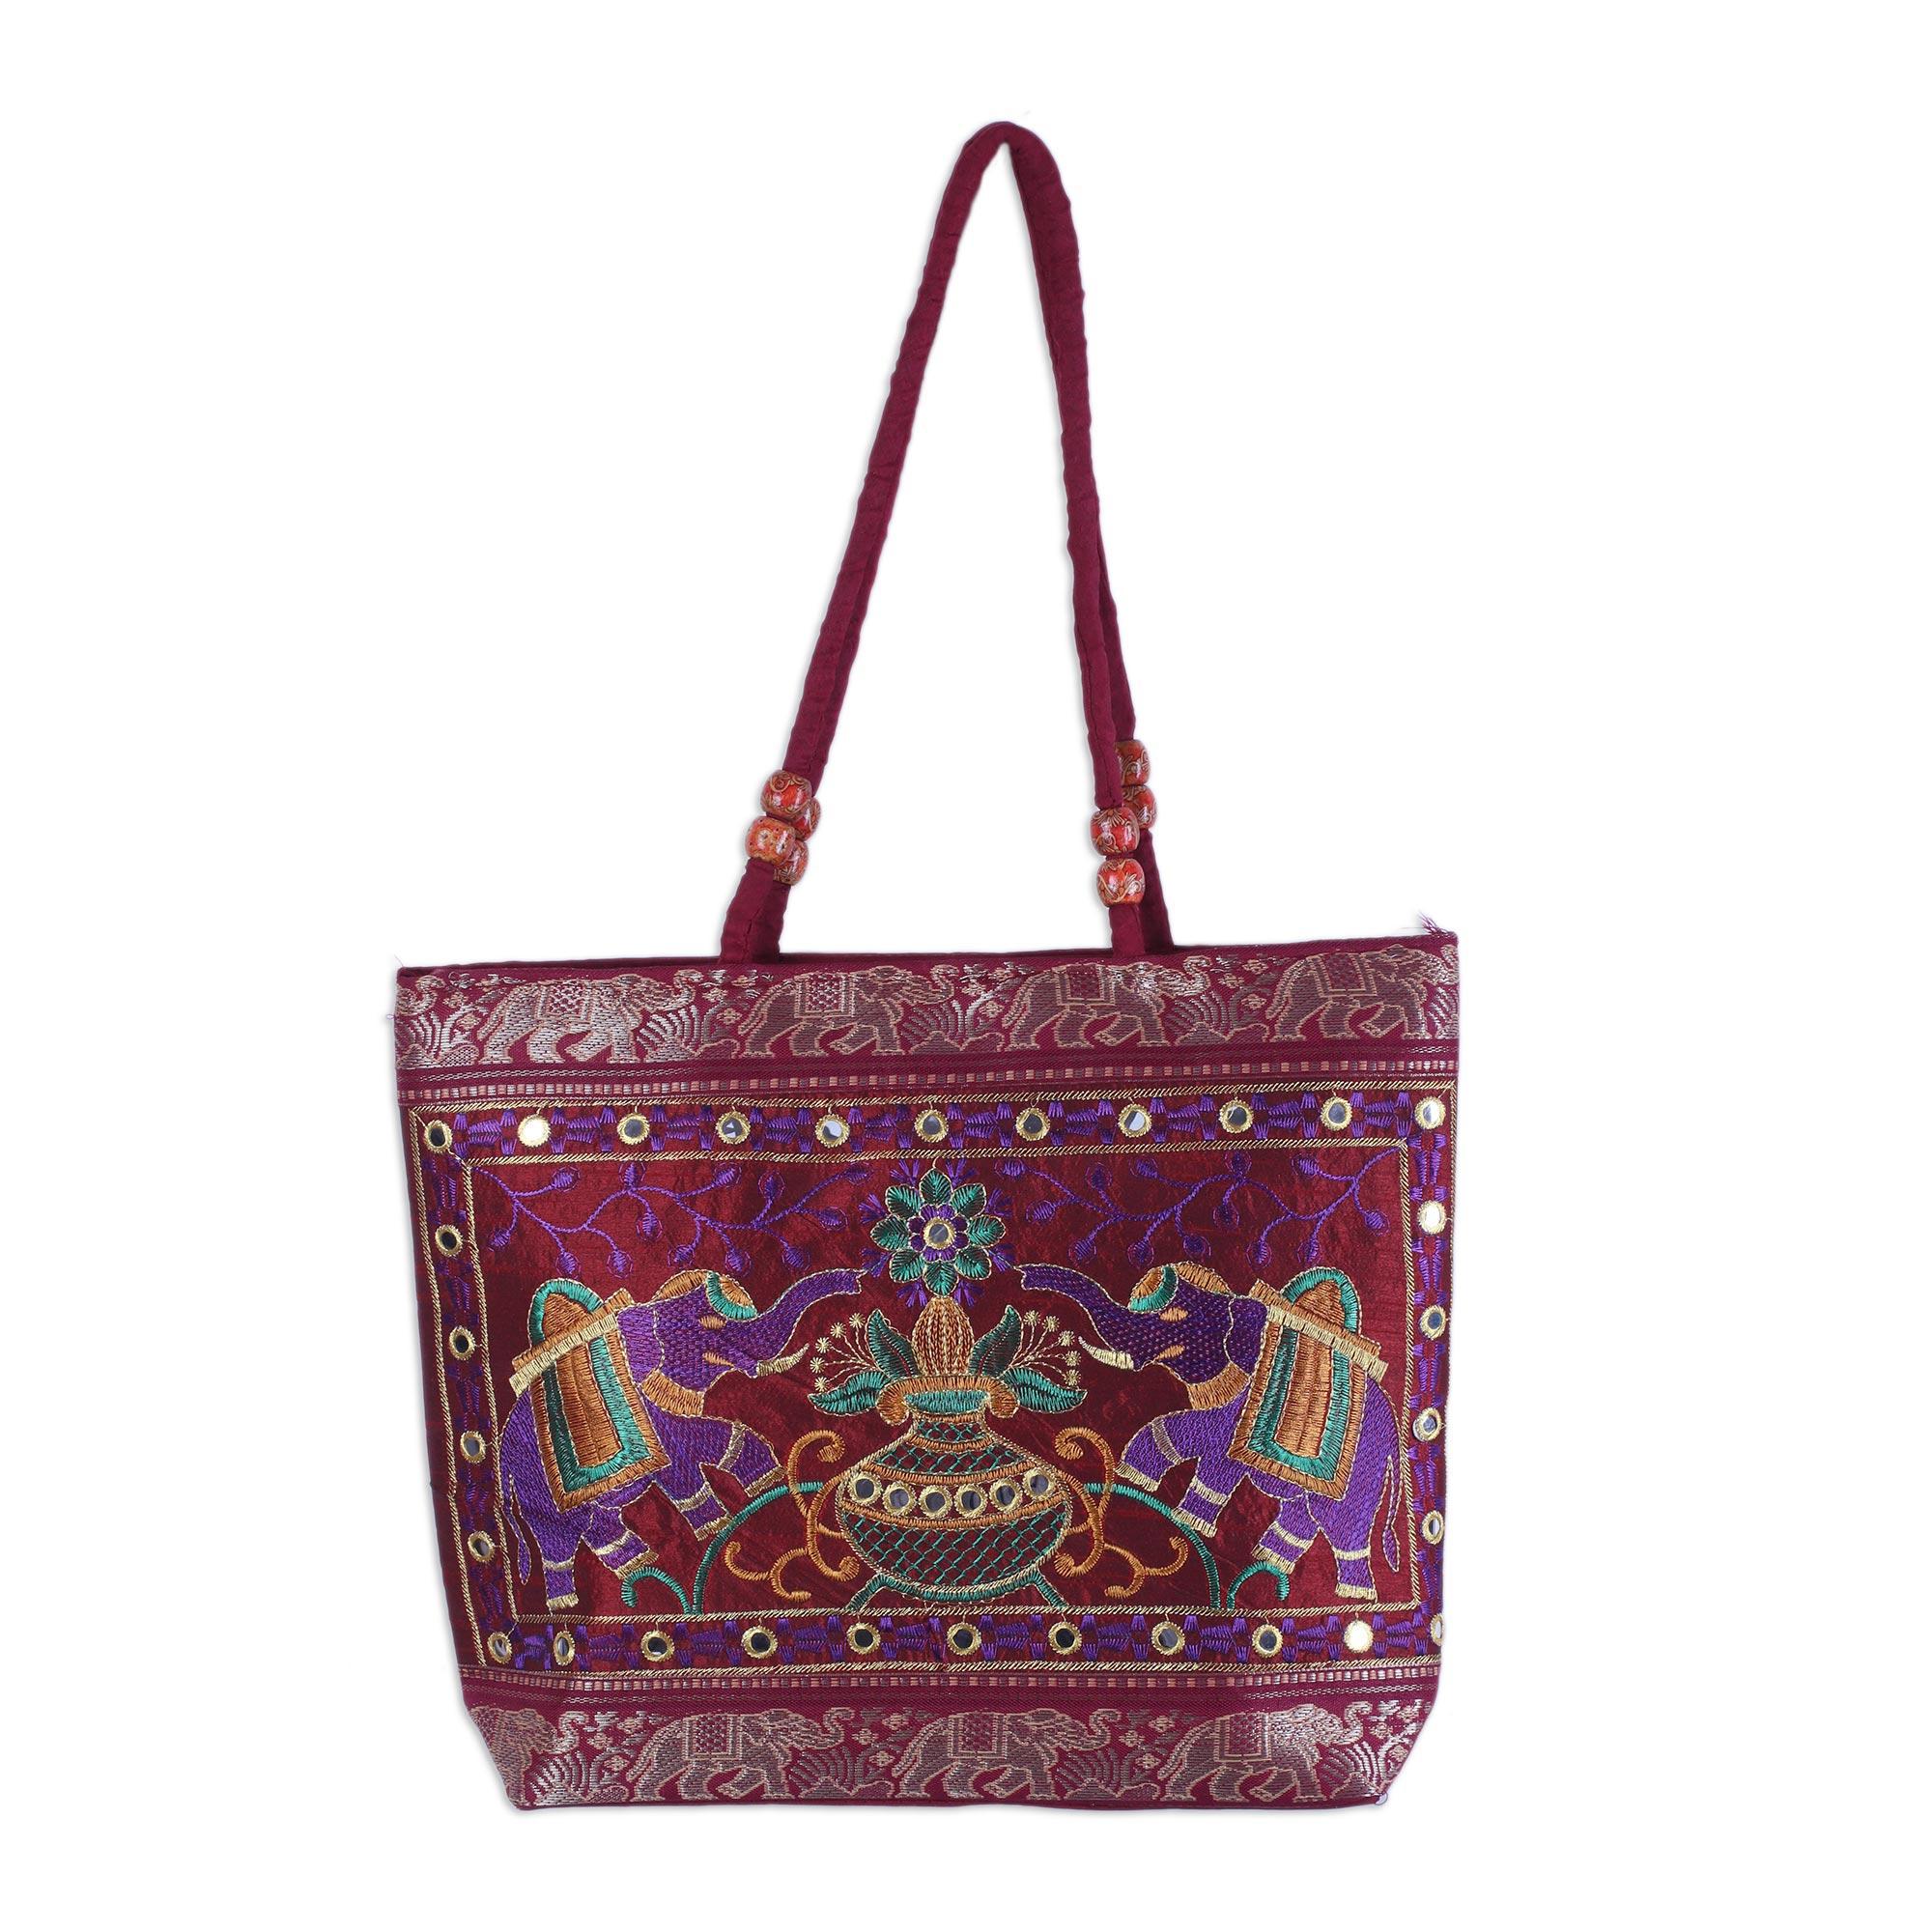 Novica Shoulder bag, Diamond Allure in Crimson